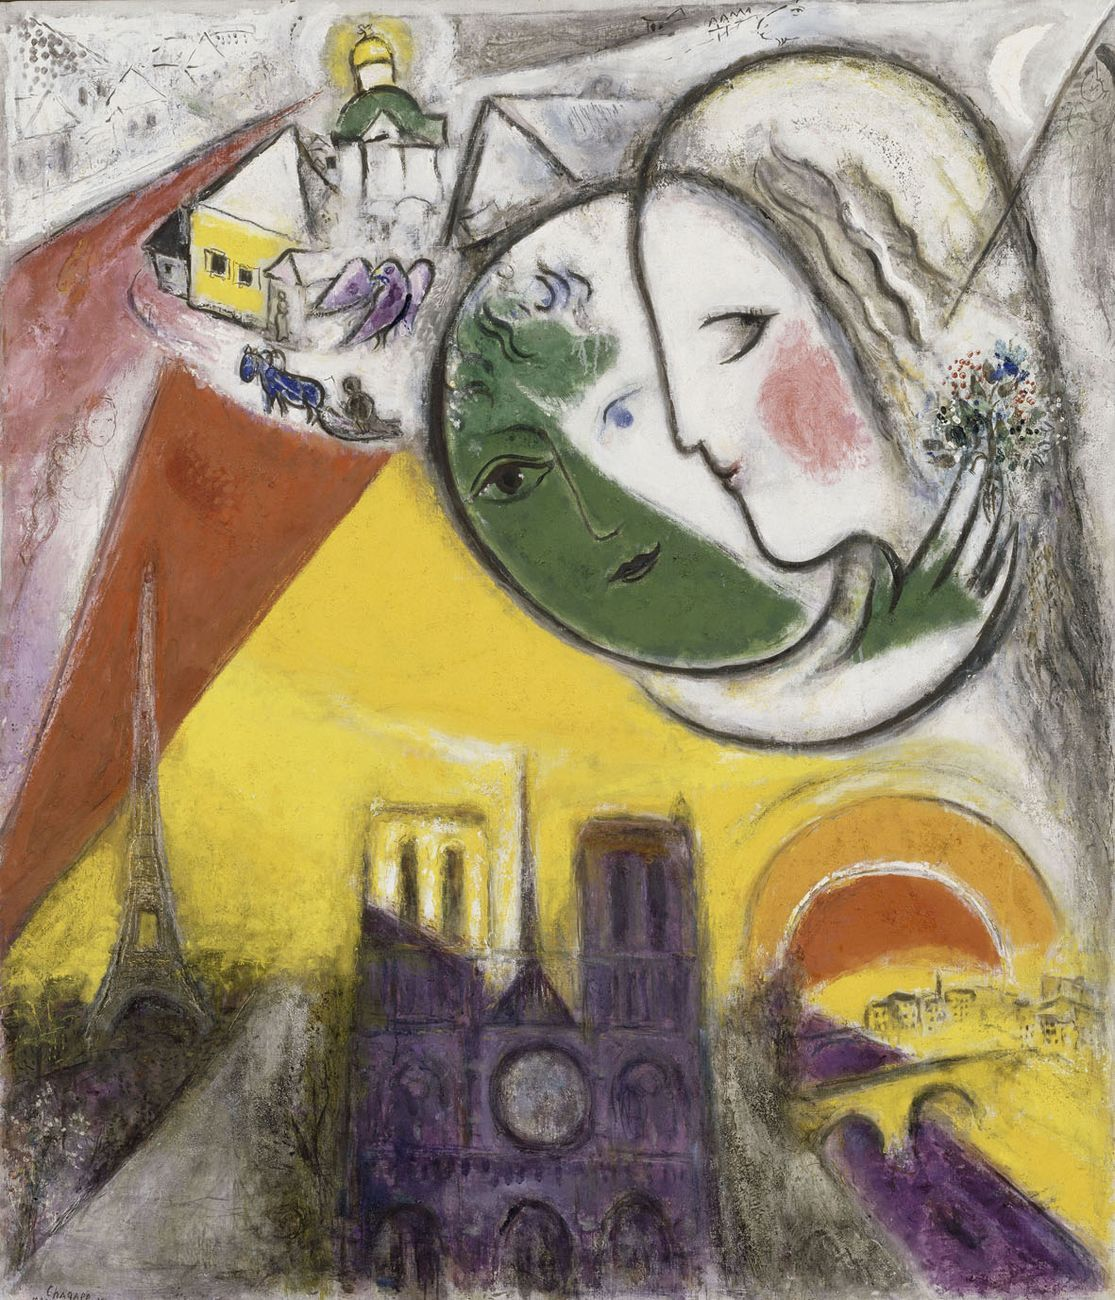 Marc Chagall, Dimanche, 1952. Parigi, Museo Nazionale di Arte Moderna